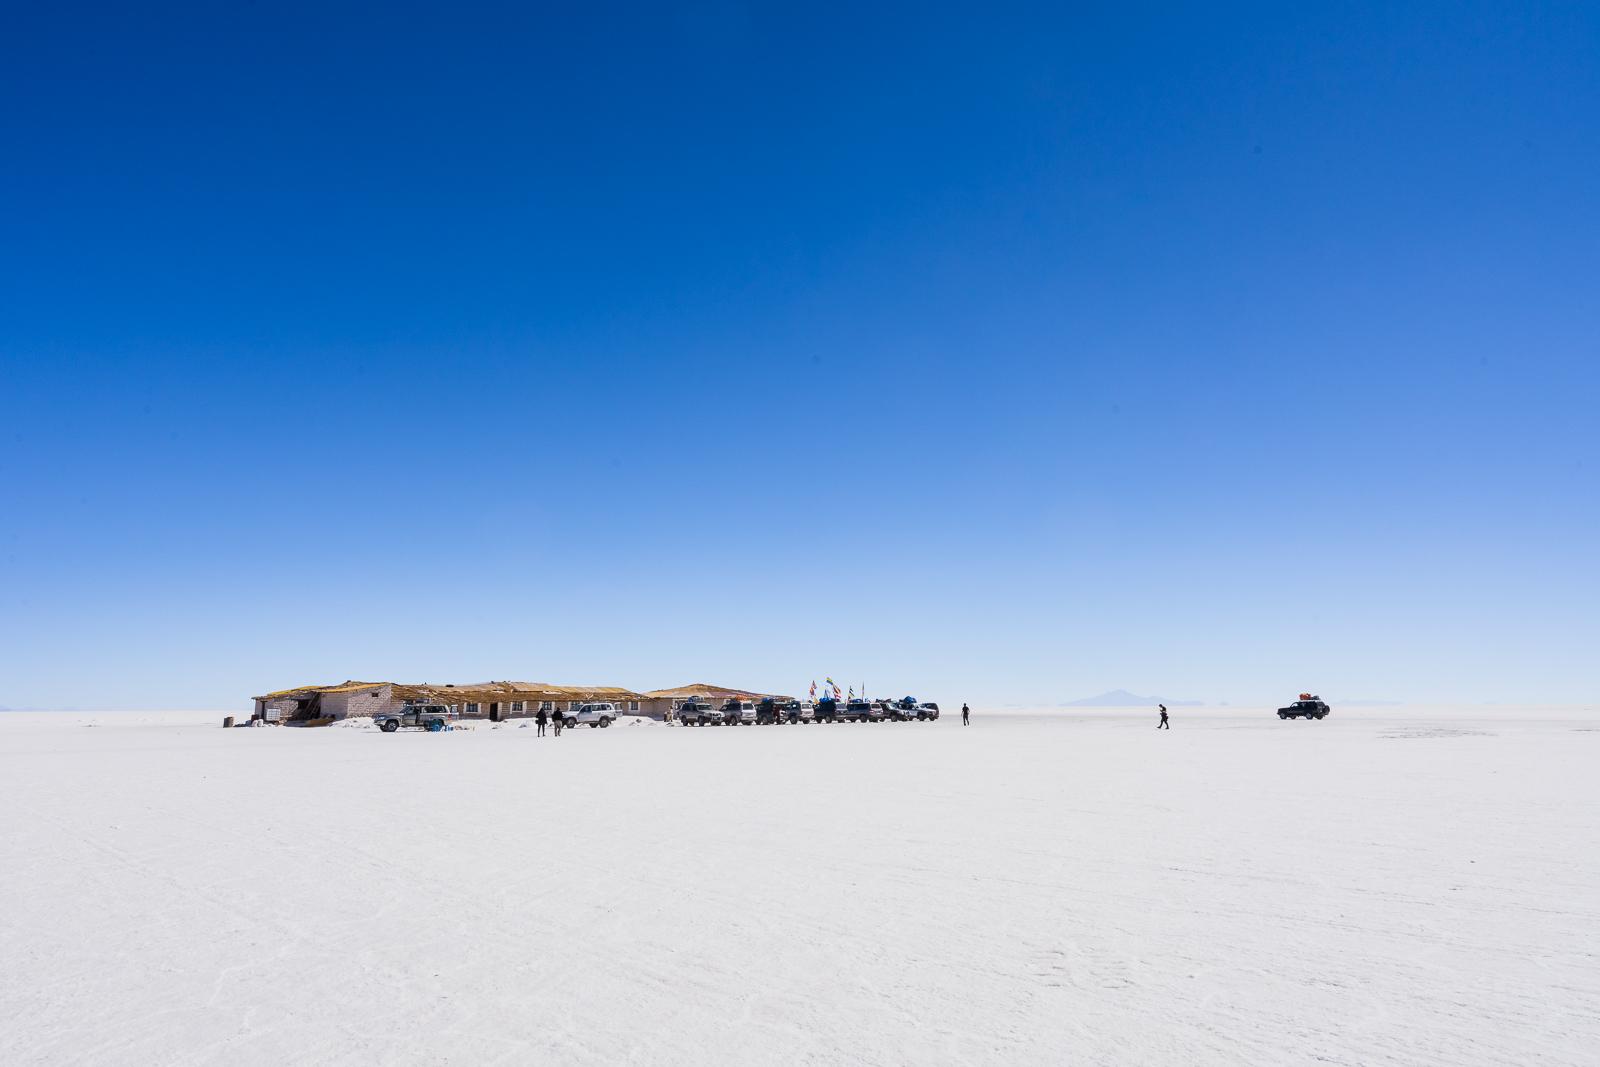 The salt hotel seen from a distance